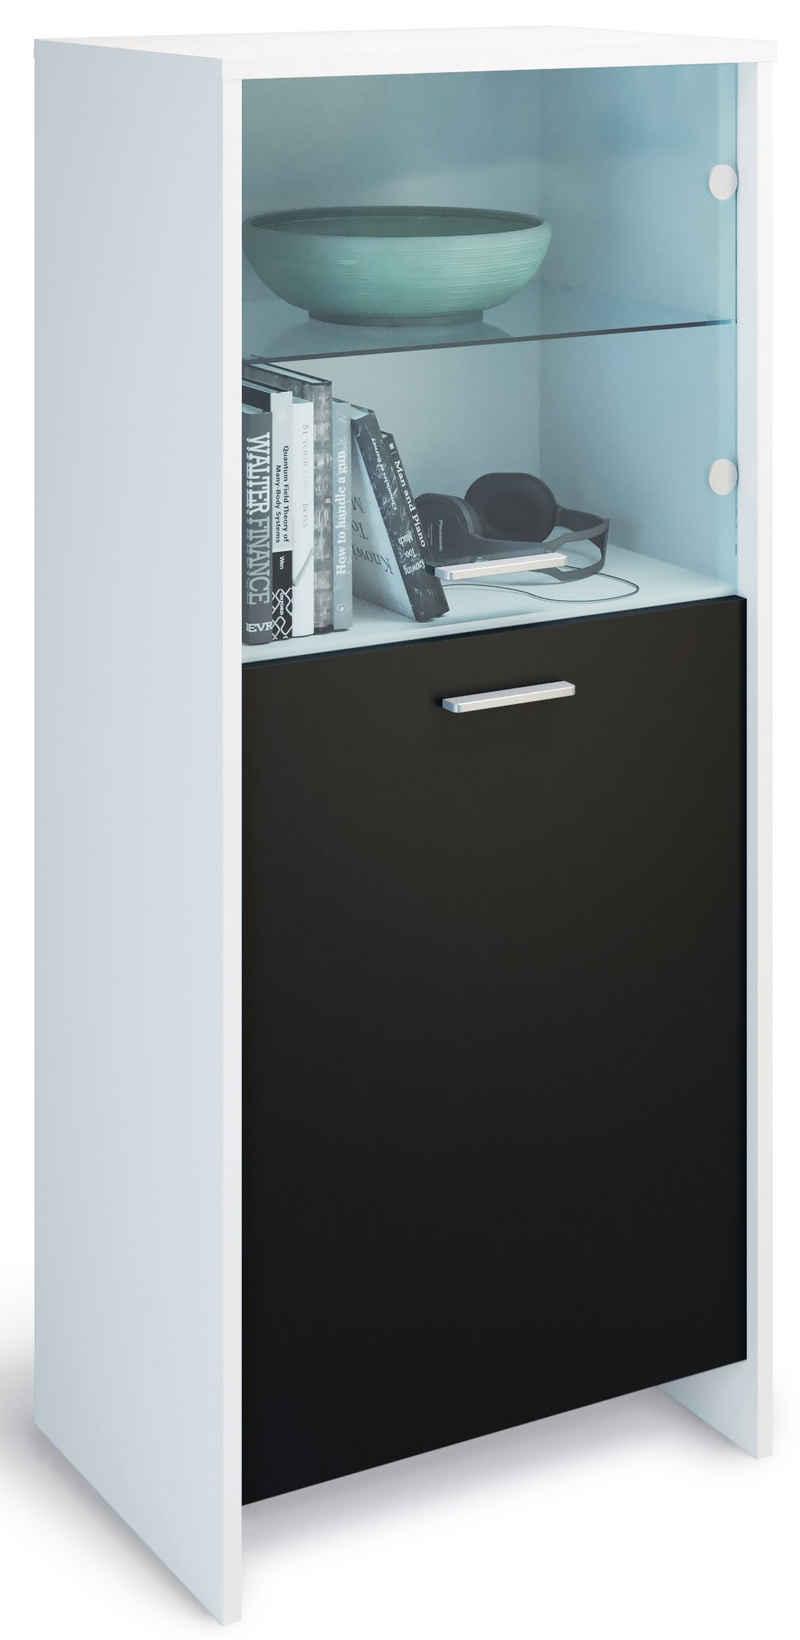 Domando Standvitrine »Vitrine Matera« (1-St) Breite 53cm, Tür mit Soft-Close